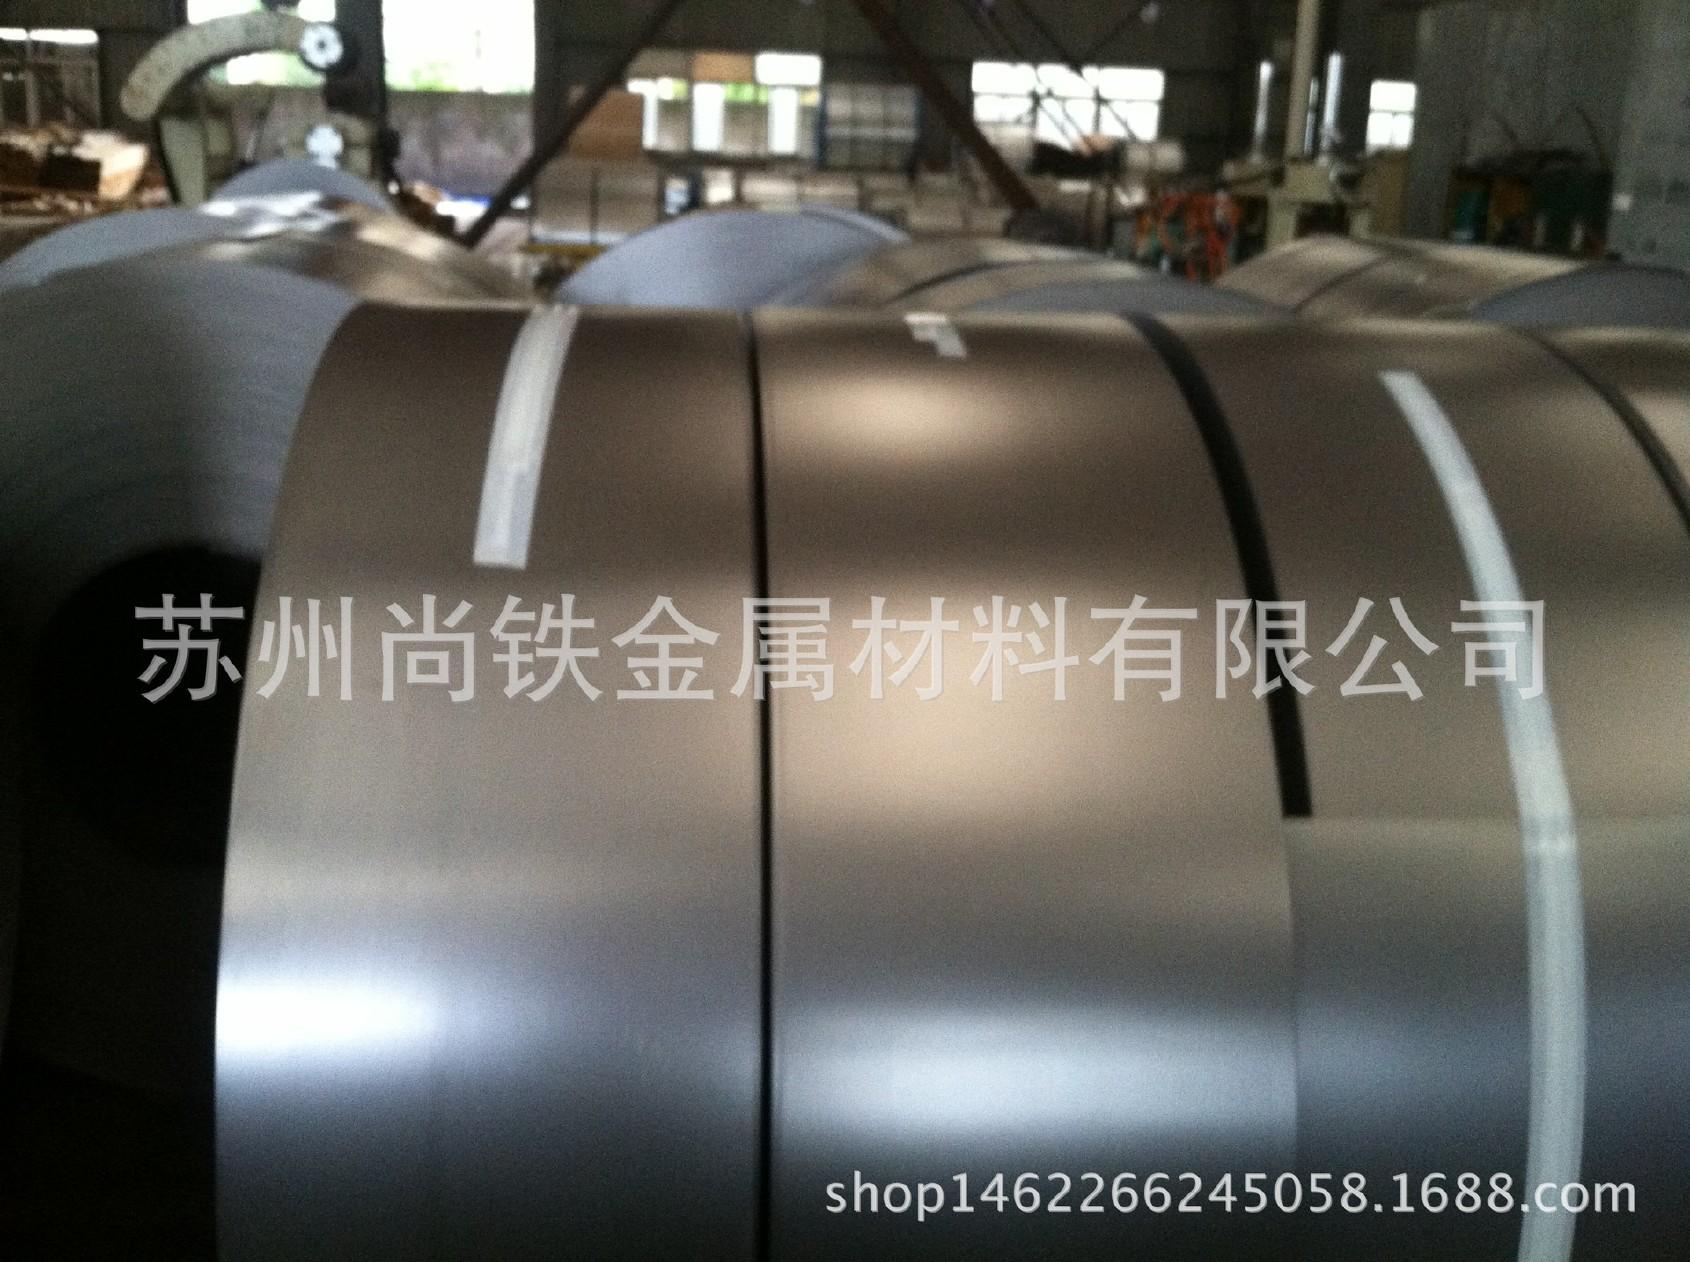 �vK�b�_hc260la.b280vk.b250p1 宝钢 马钢 高强度冷轧材料 汽车配件